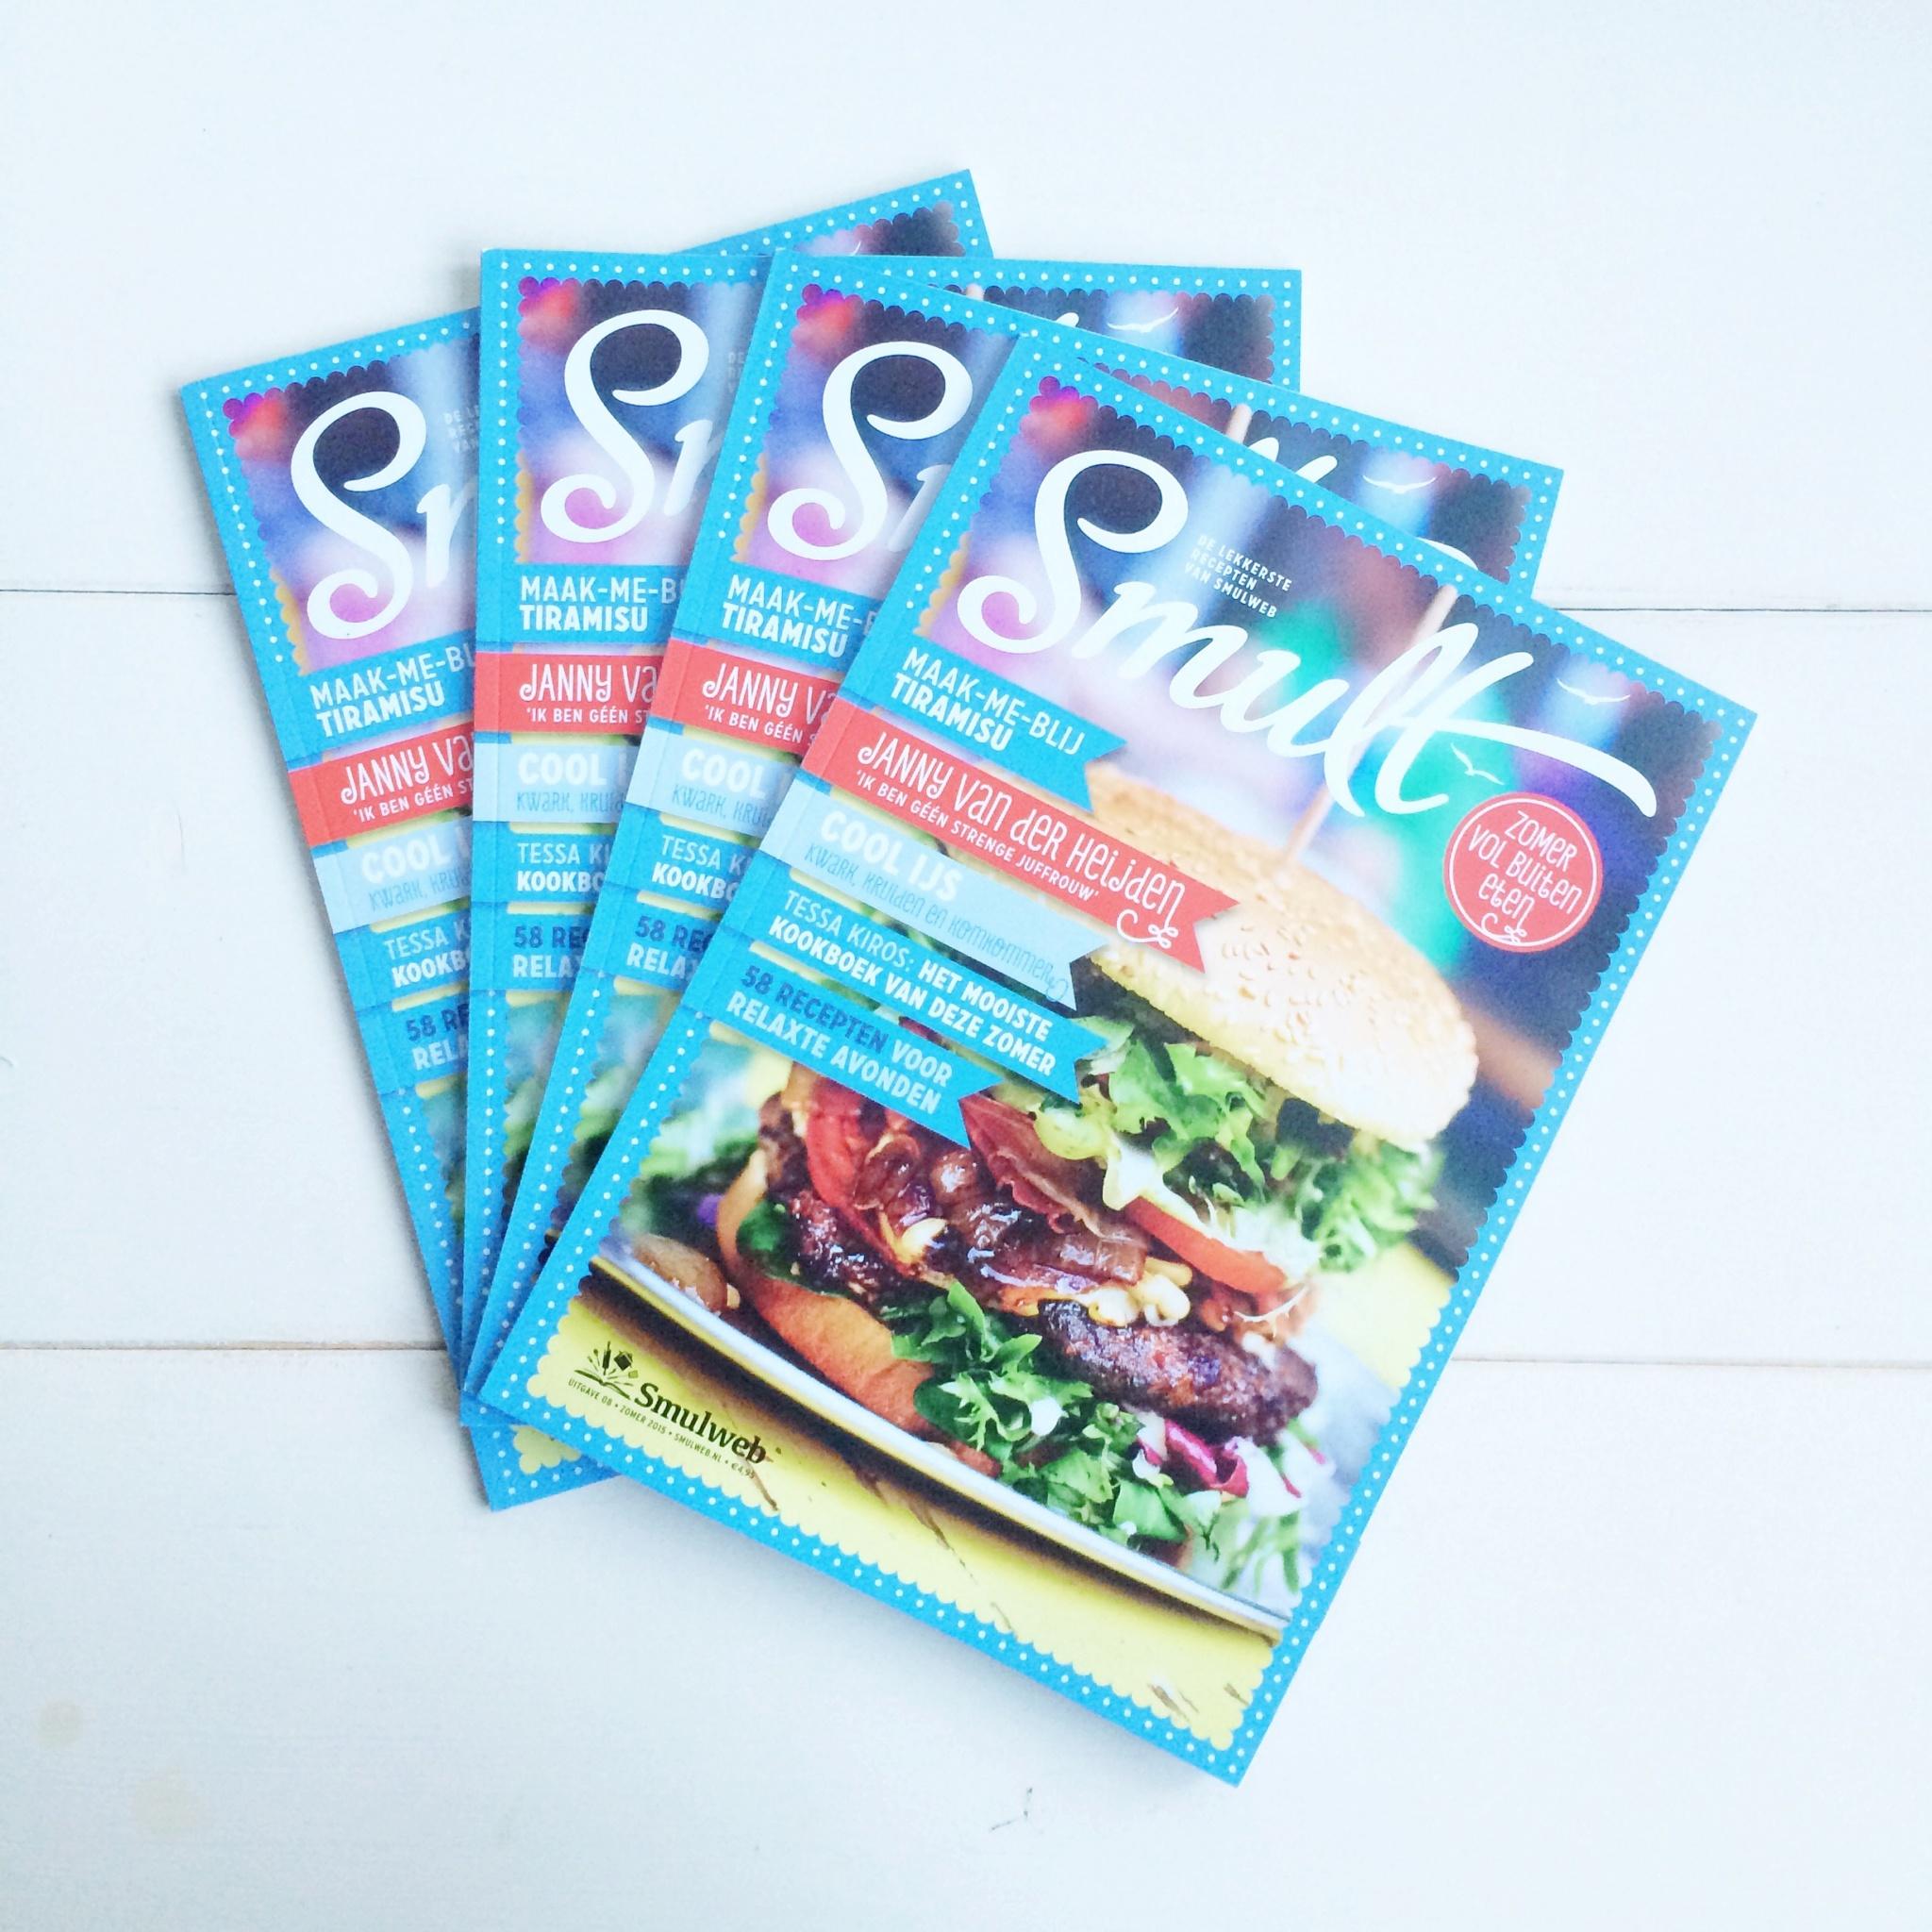 IMG 6407 - Inspiratie: Smult Magazine